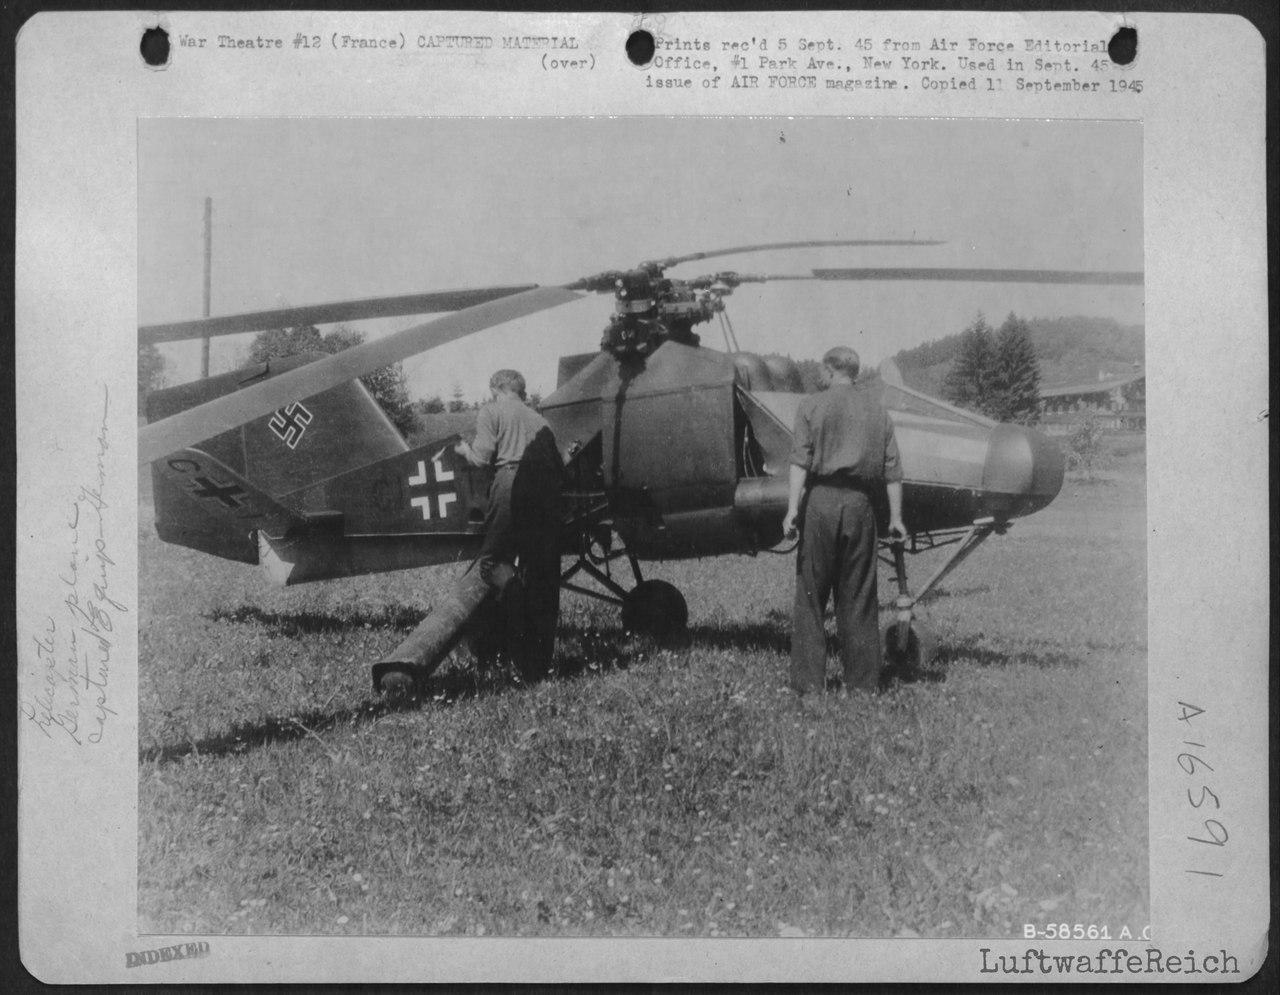 Flettner Fl 282 Kolibri, Западная Европа '40 гг.